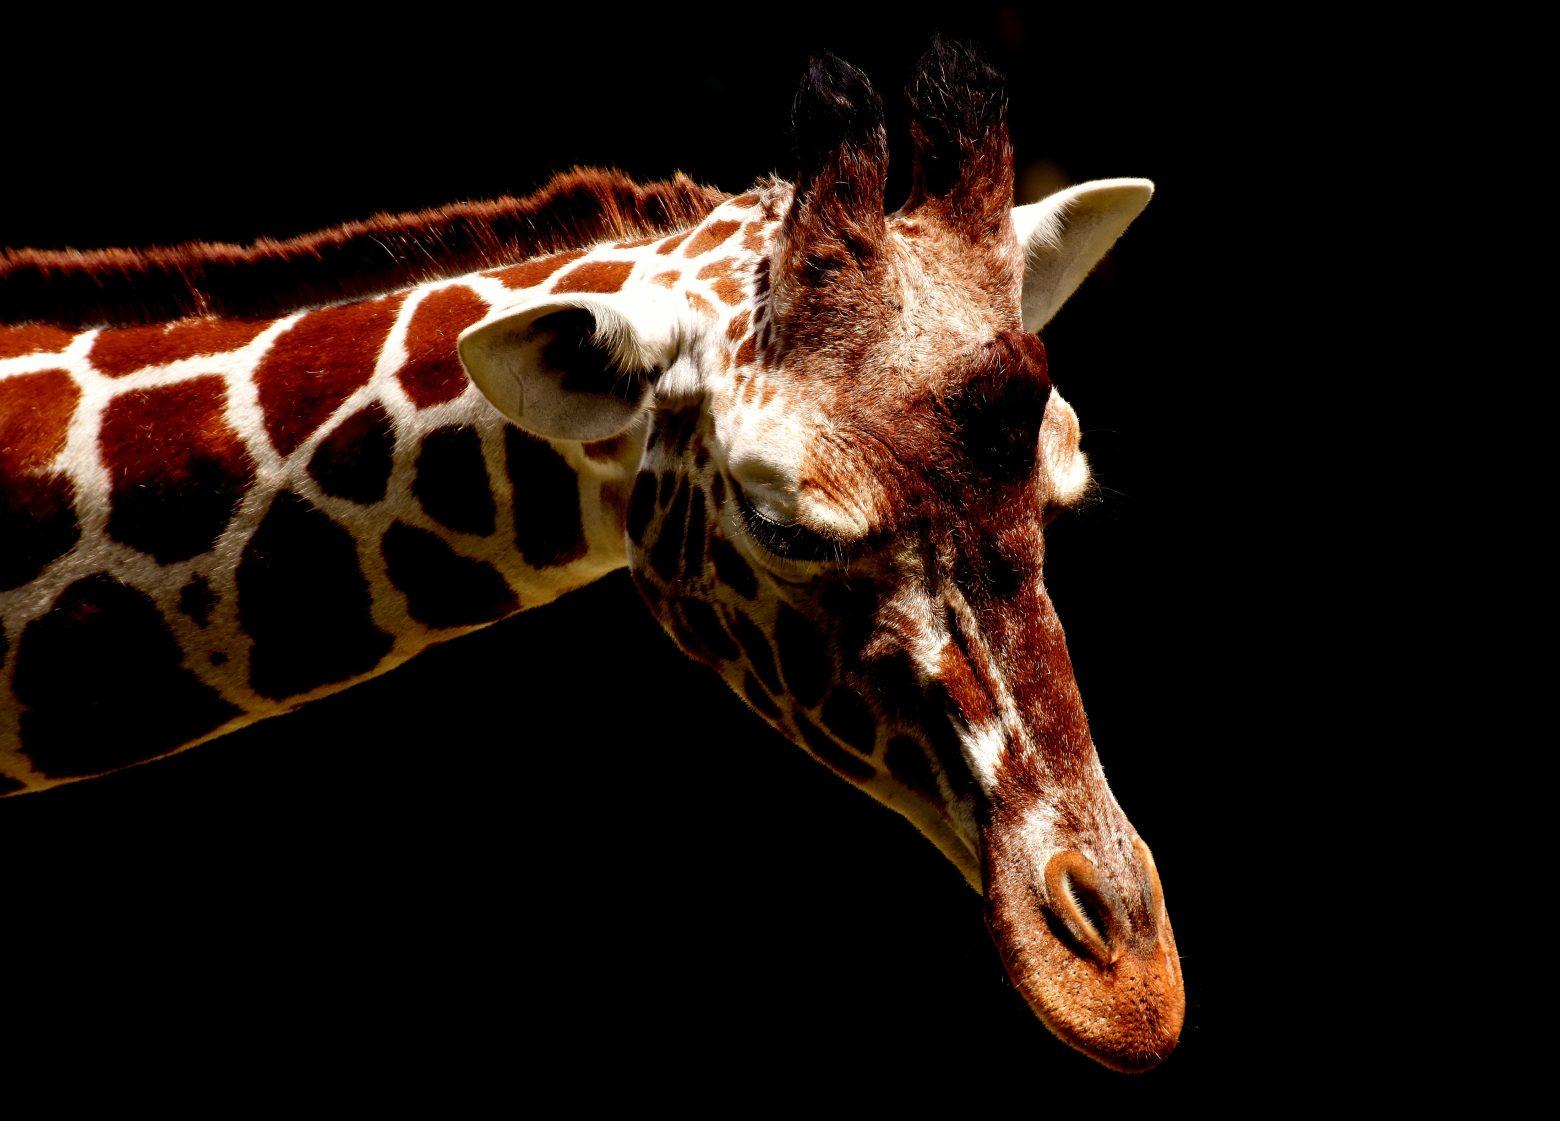 giraffe-2325160